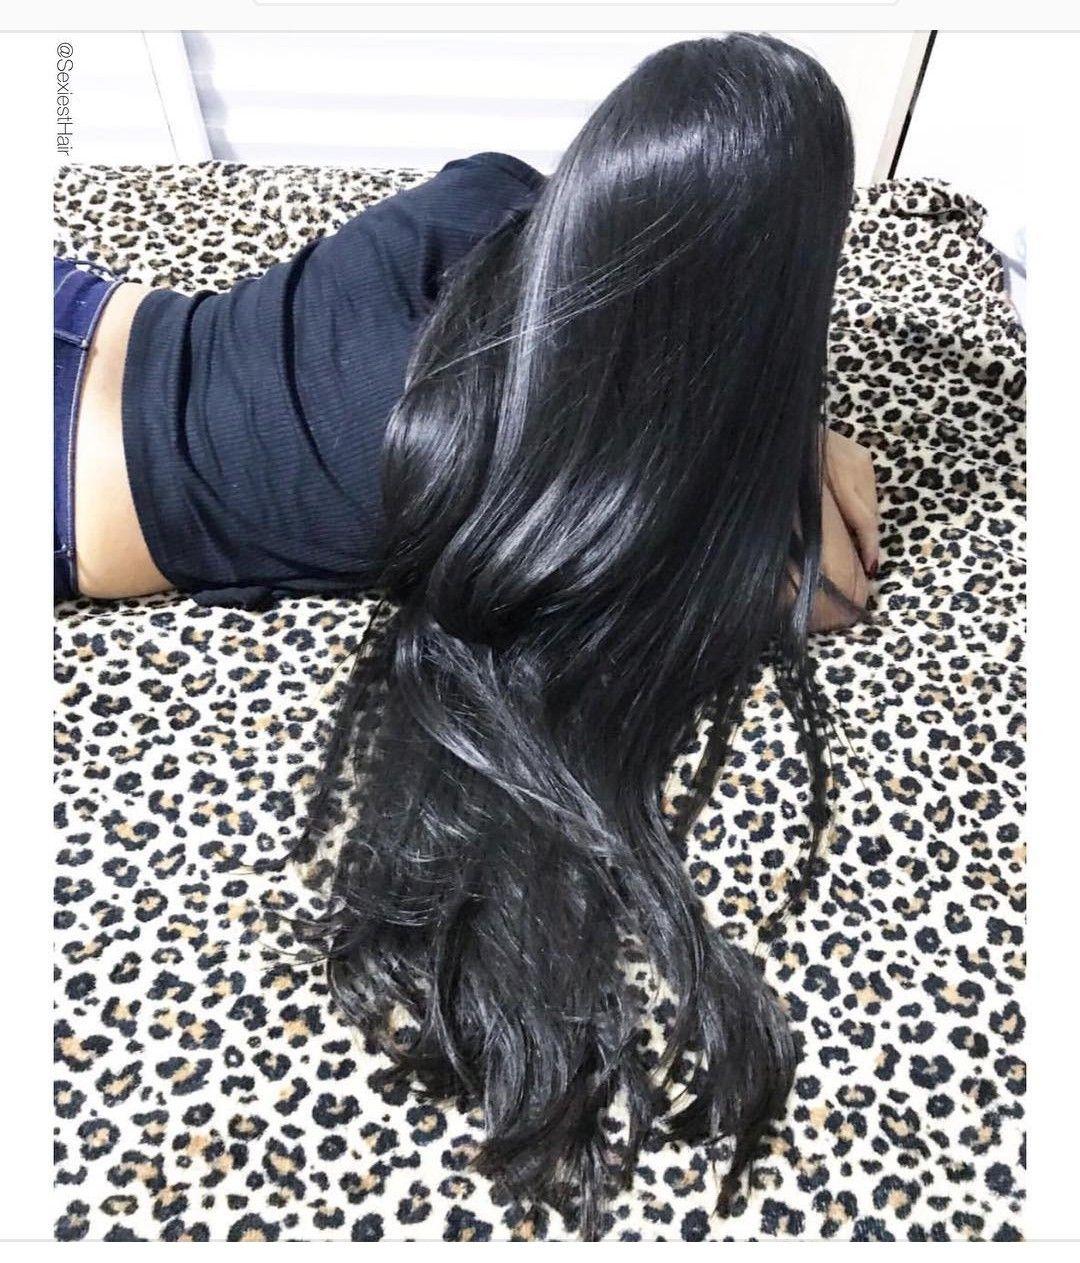 Jet Black Long Straight Hair. Sleek and beautiful.  Long hair